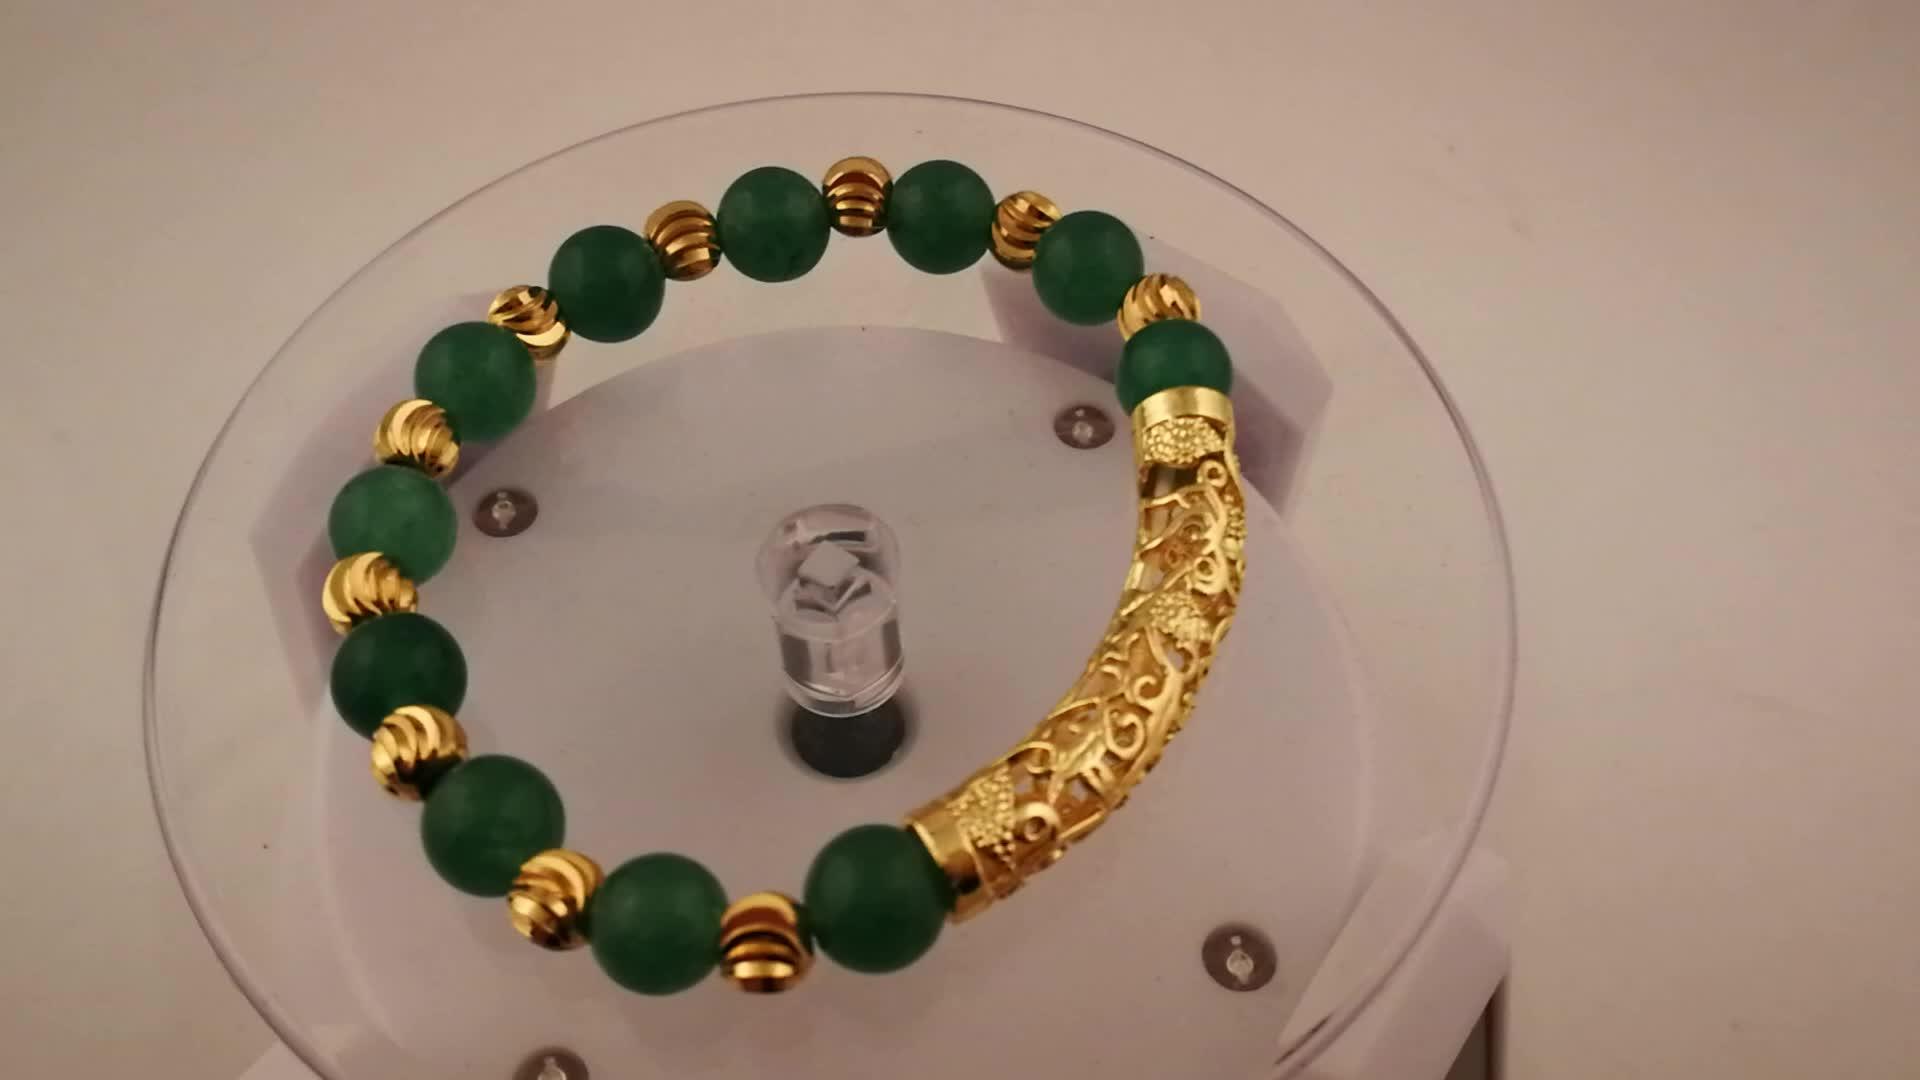 BDB01 European and American Hot Selling Natural Powder Crystal Calm Emotions Power Bead Bracelet